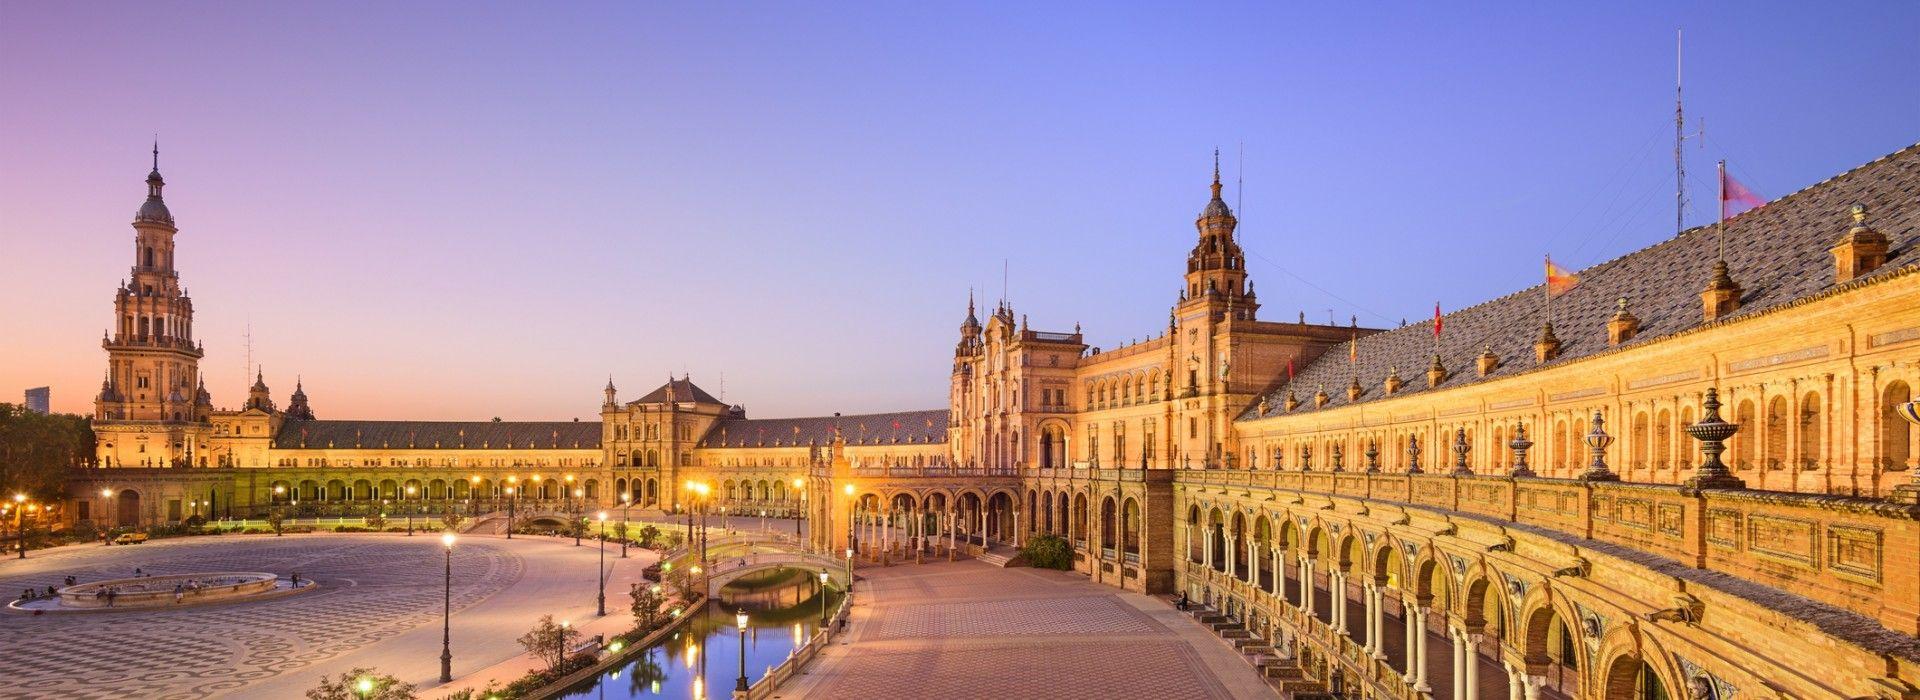 Zip lining Tours in Spain